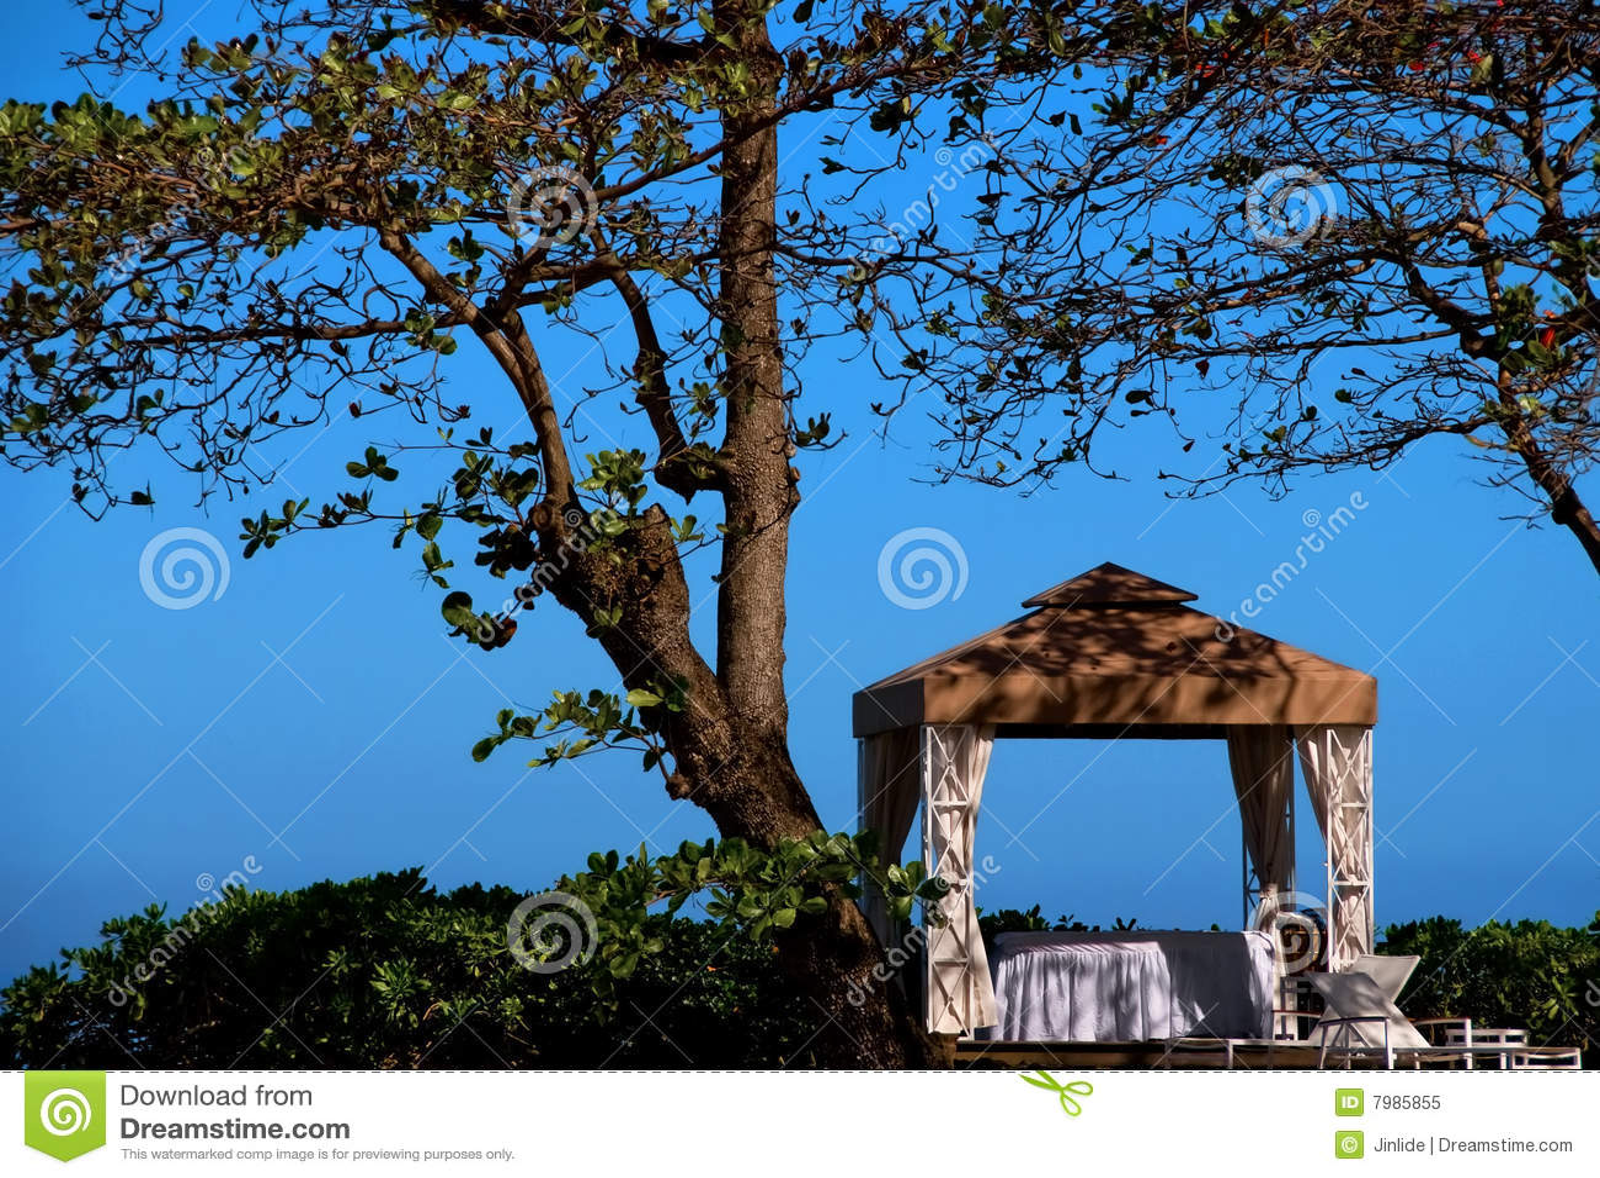 Seaside massage tent